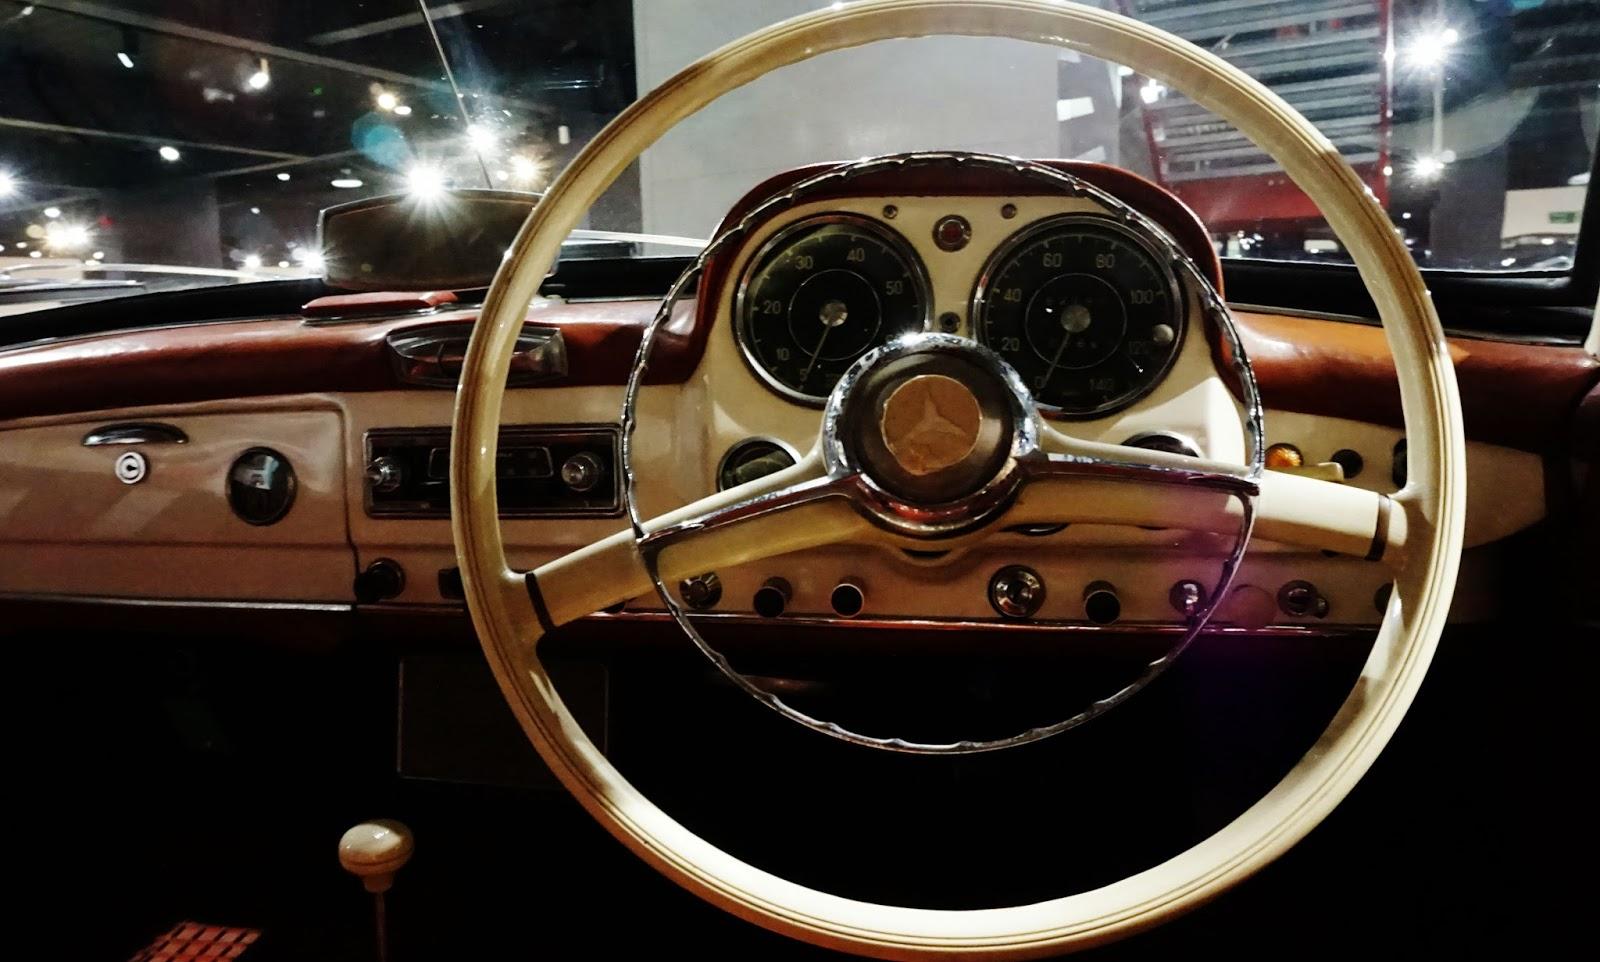 classic car super car model steering wheel interiors haynes motor museum